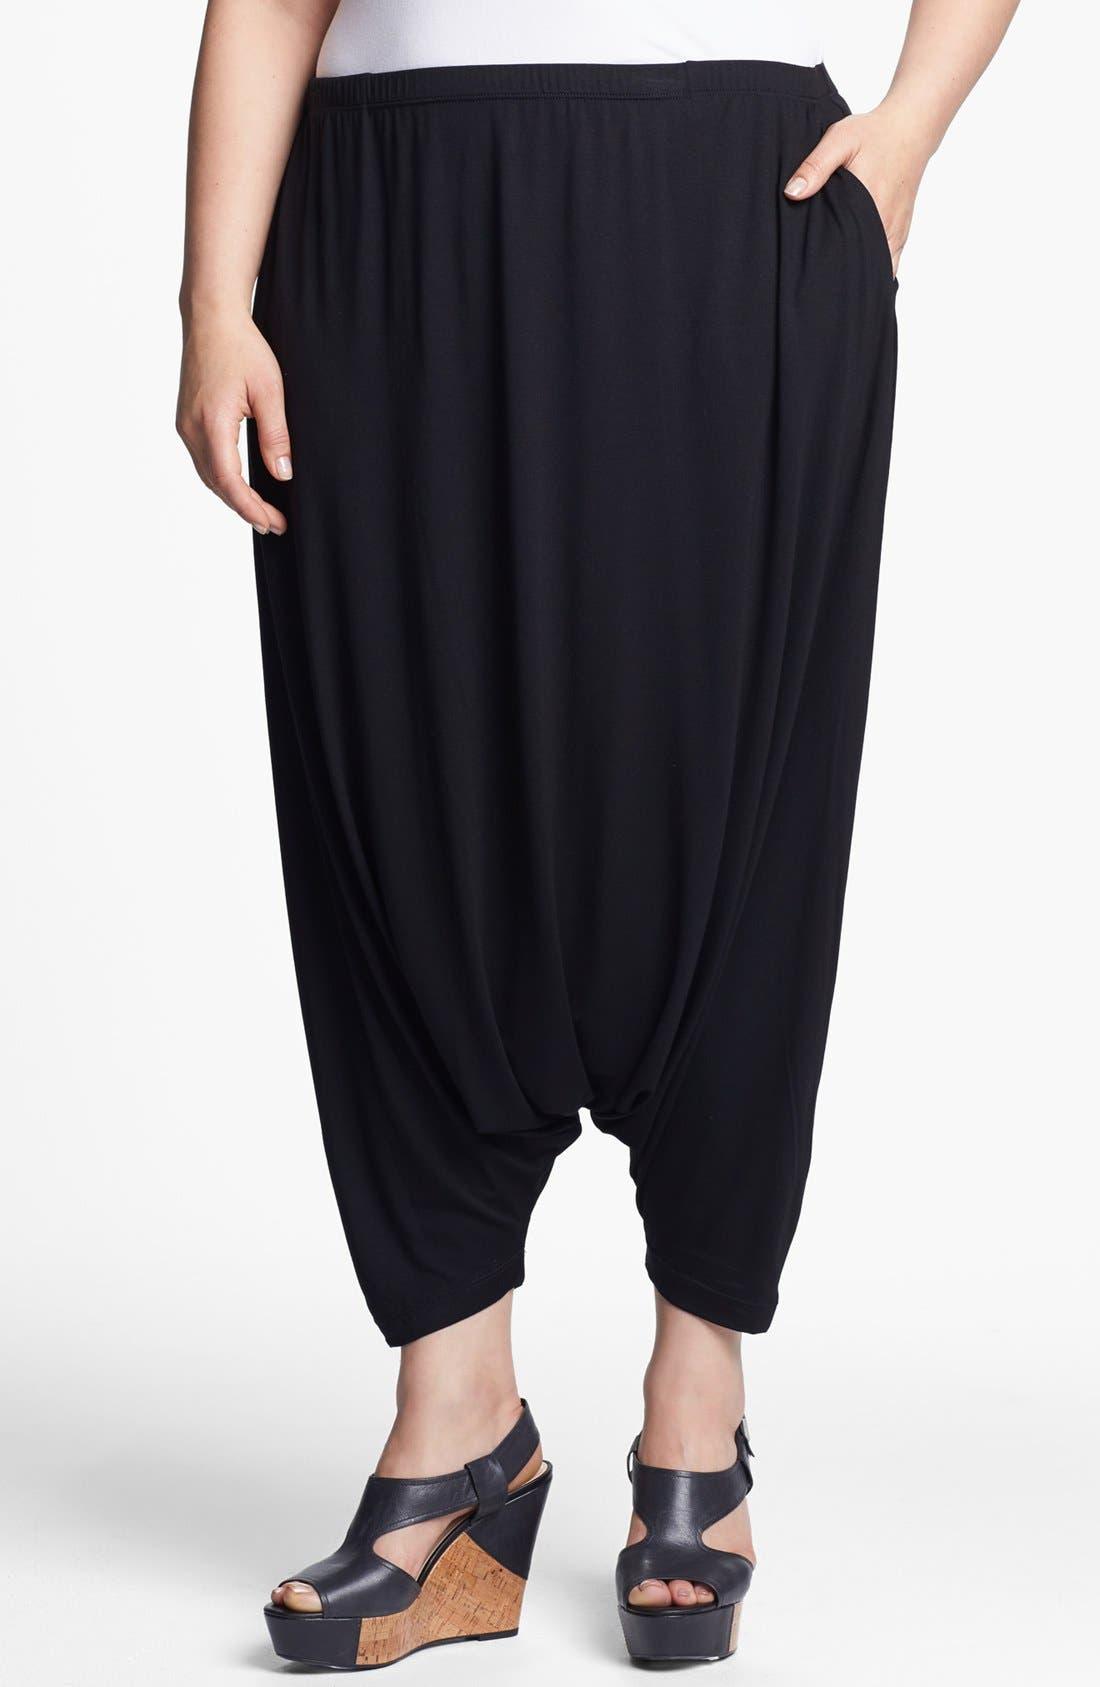 Alternate Image 1 Selected - Eileen Fisher Harem Pants (Plus Size)